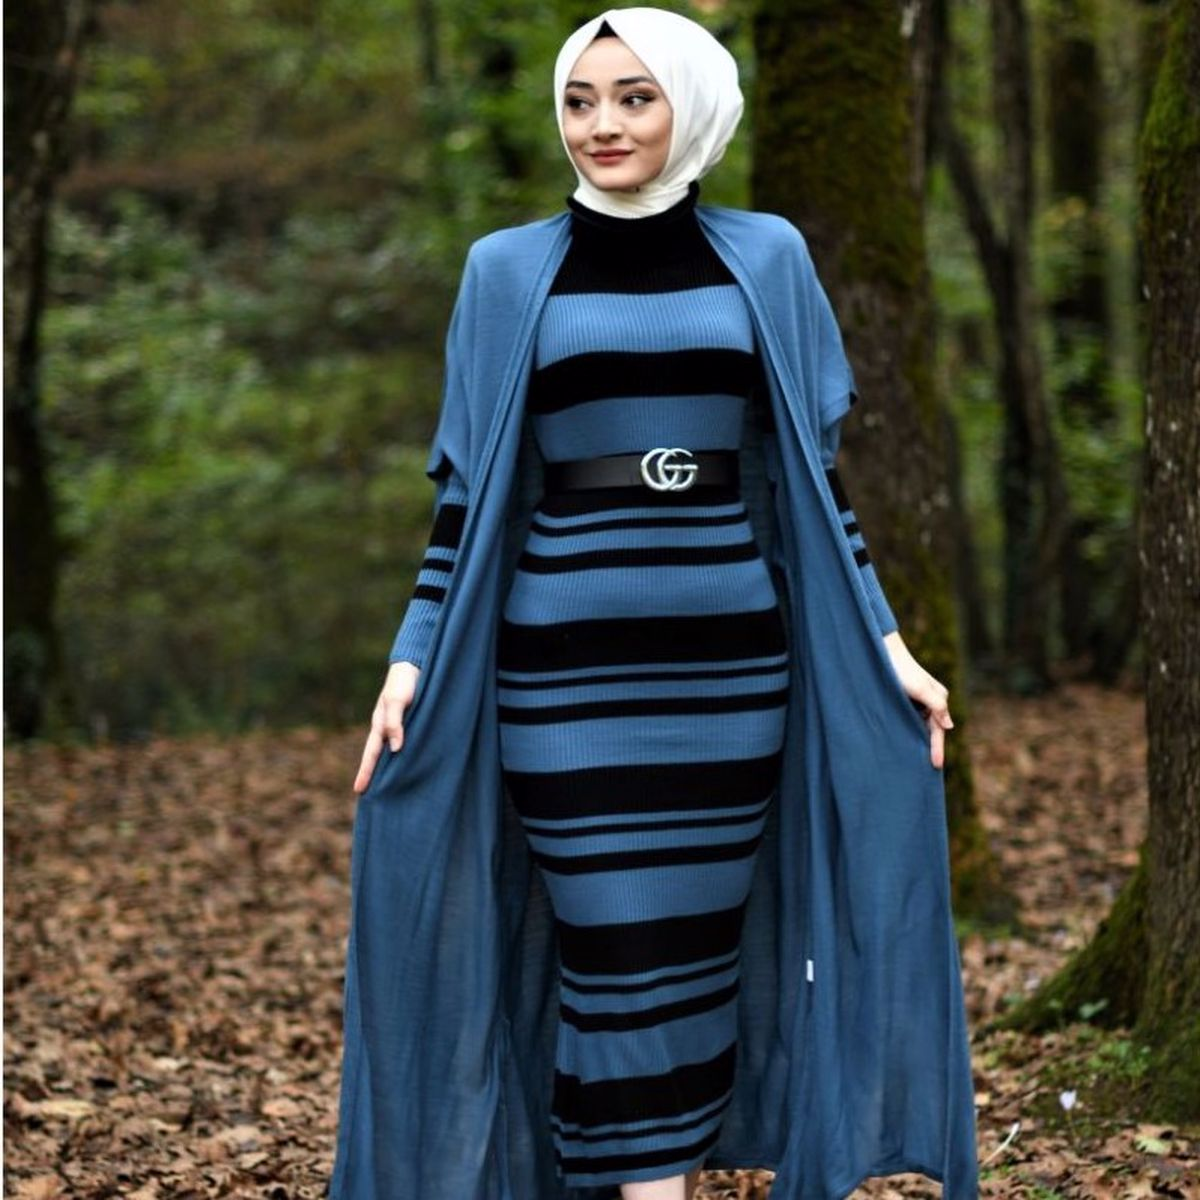 2 Pieces Striped Women's Set, Maxi Dress and Cardigan Double Suit For Winter Islamic Fashion Muslim Clothing Turkey Dubai 2021